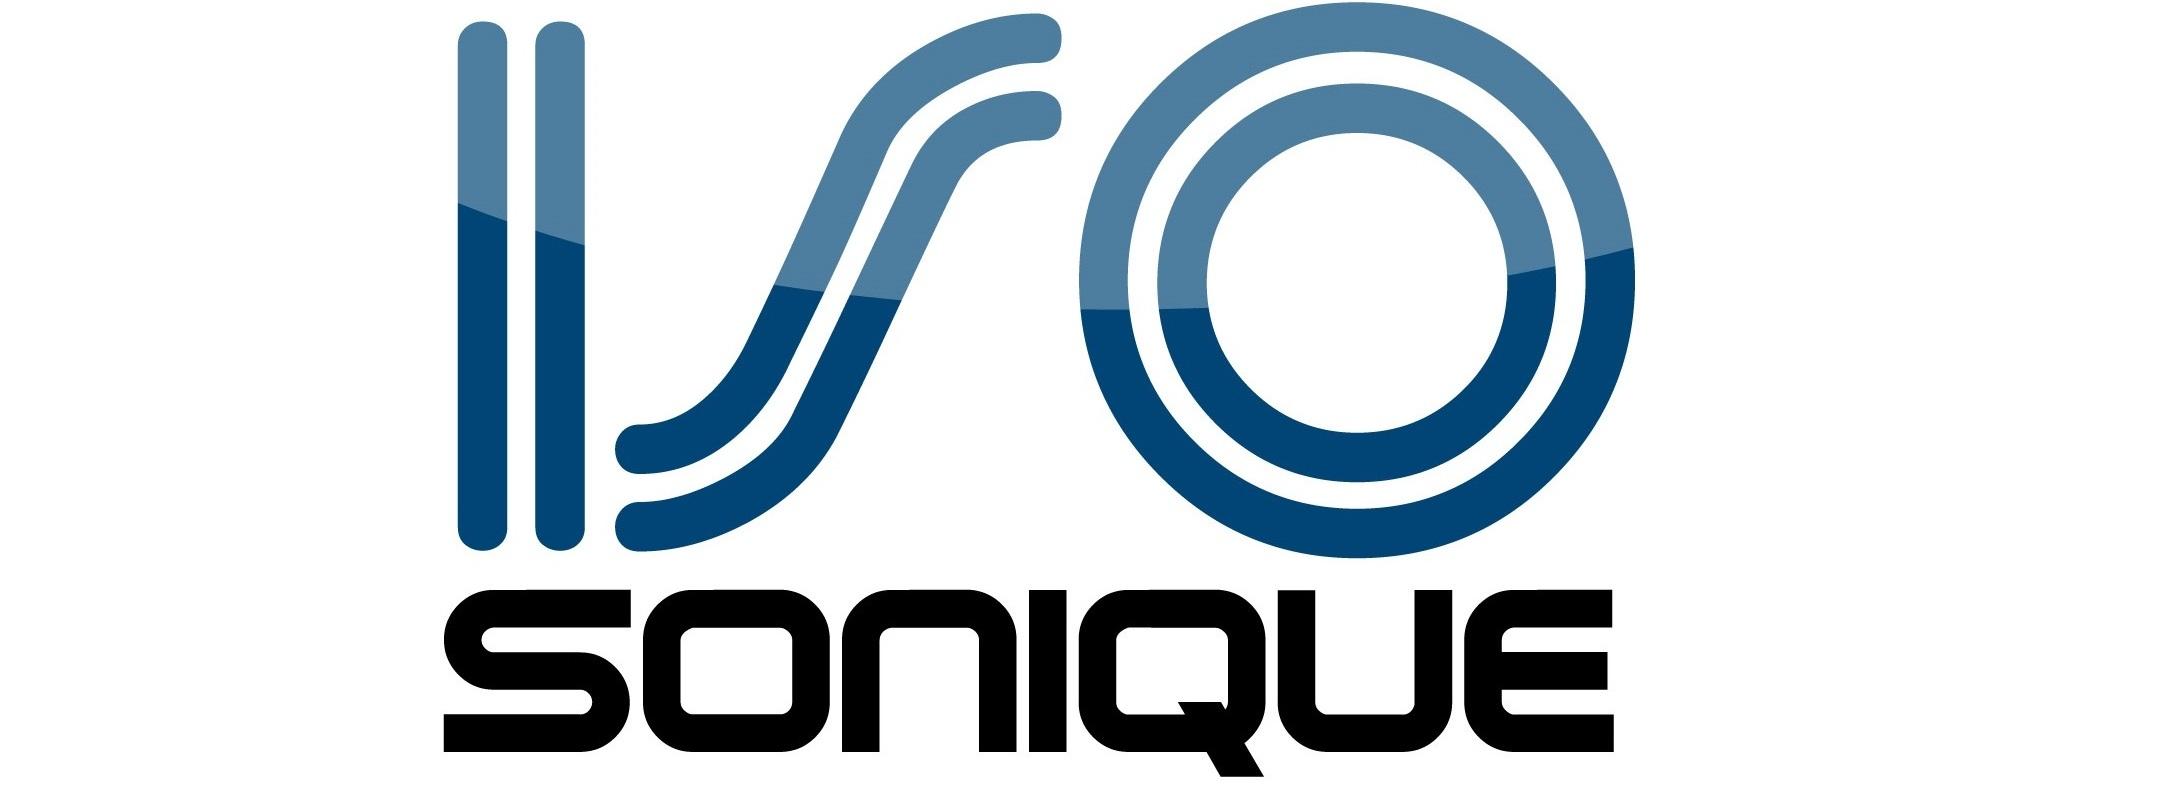 Logo_iso_sonique_169